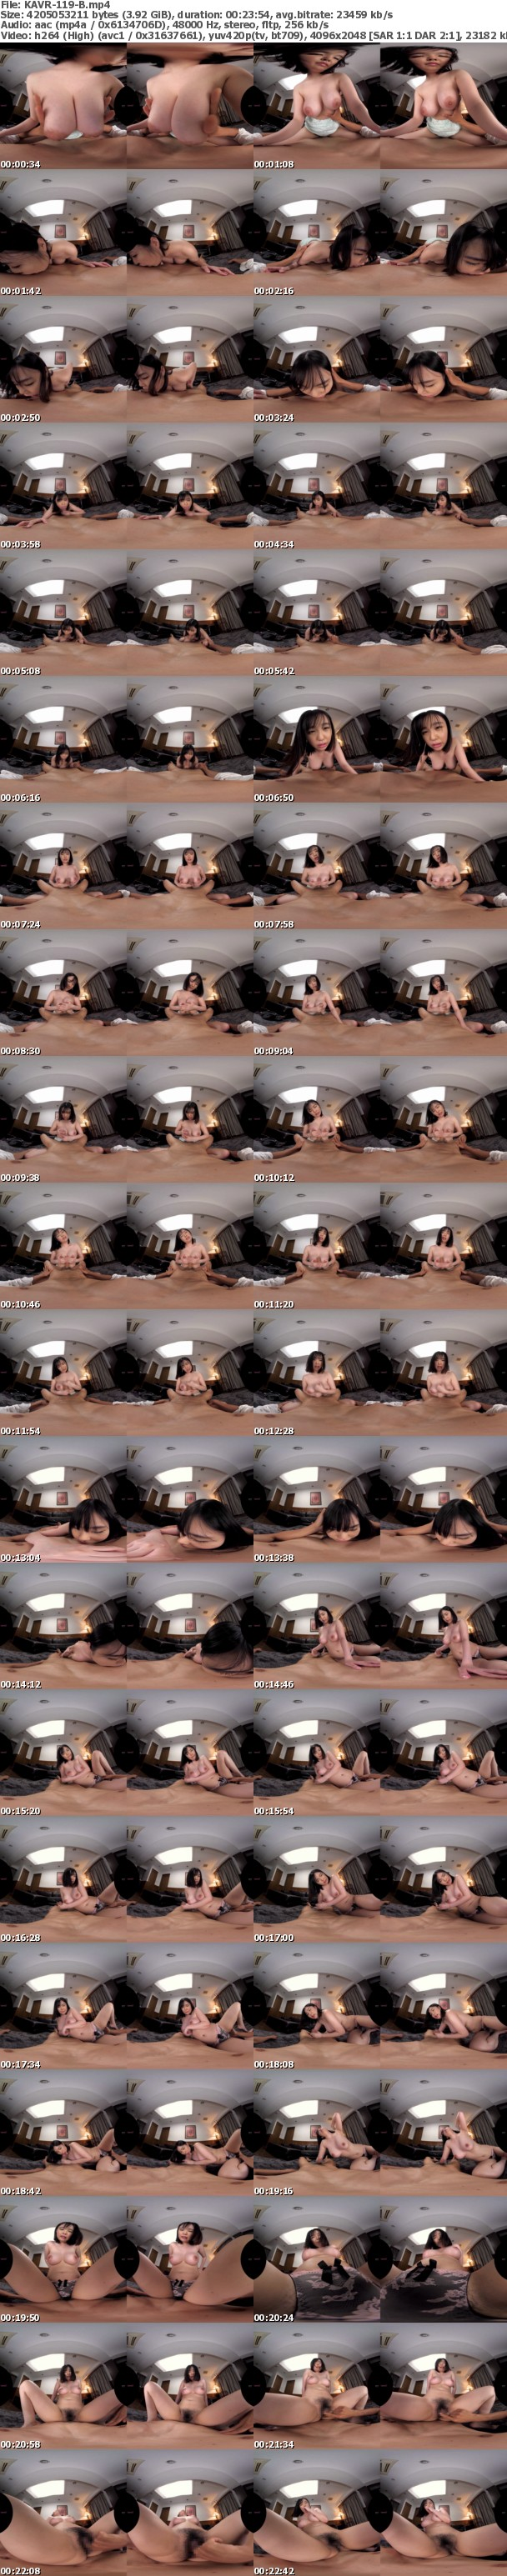 (VR) KAVR-119 Hcupおっぱい×19歳 犯罪級のぴちぴち愛人 「最後にもう一度だけ…」妻に浮気がバレて最後の逢瀬 過去最高にイキ乱れた超濃密中出しラストセックス 露梨あやせ